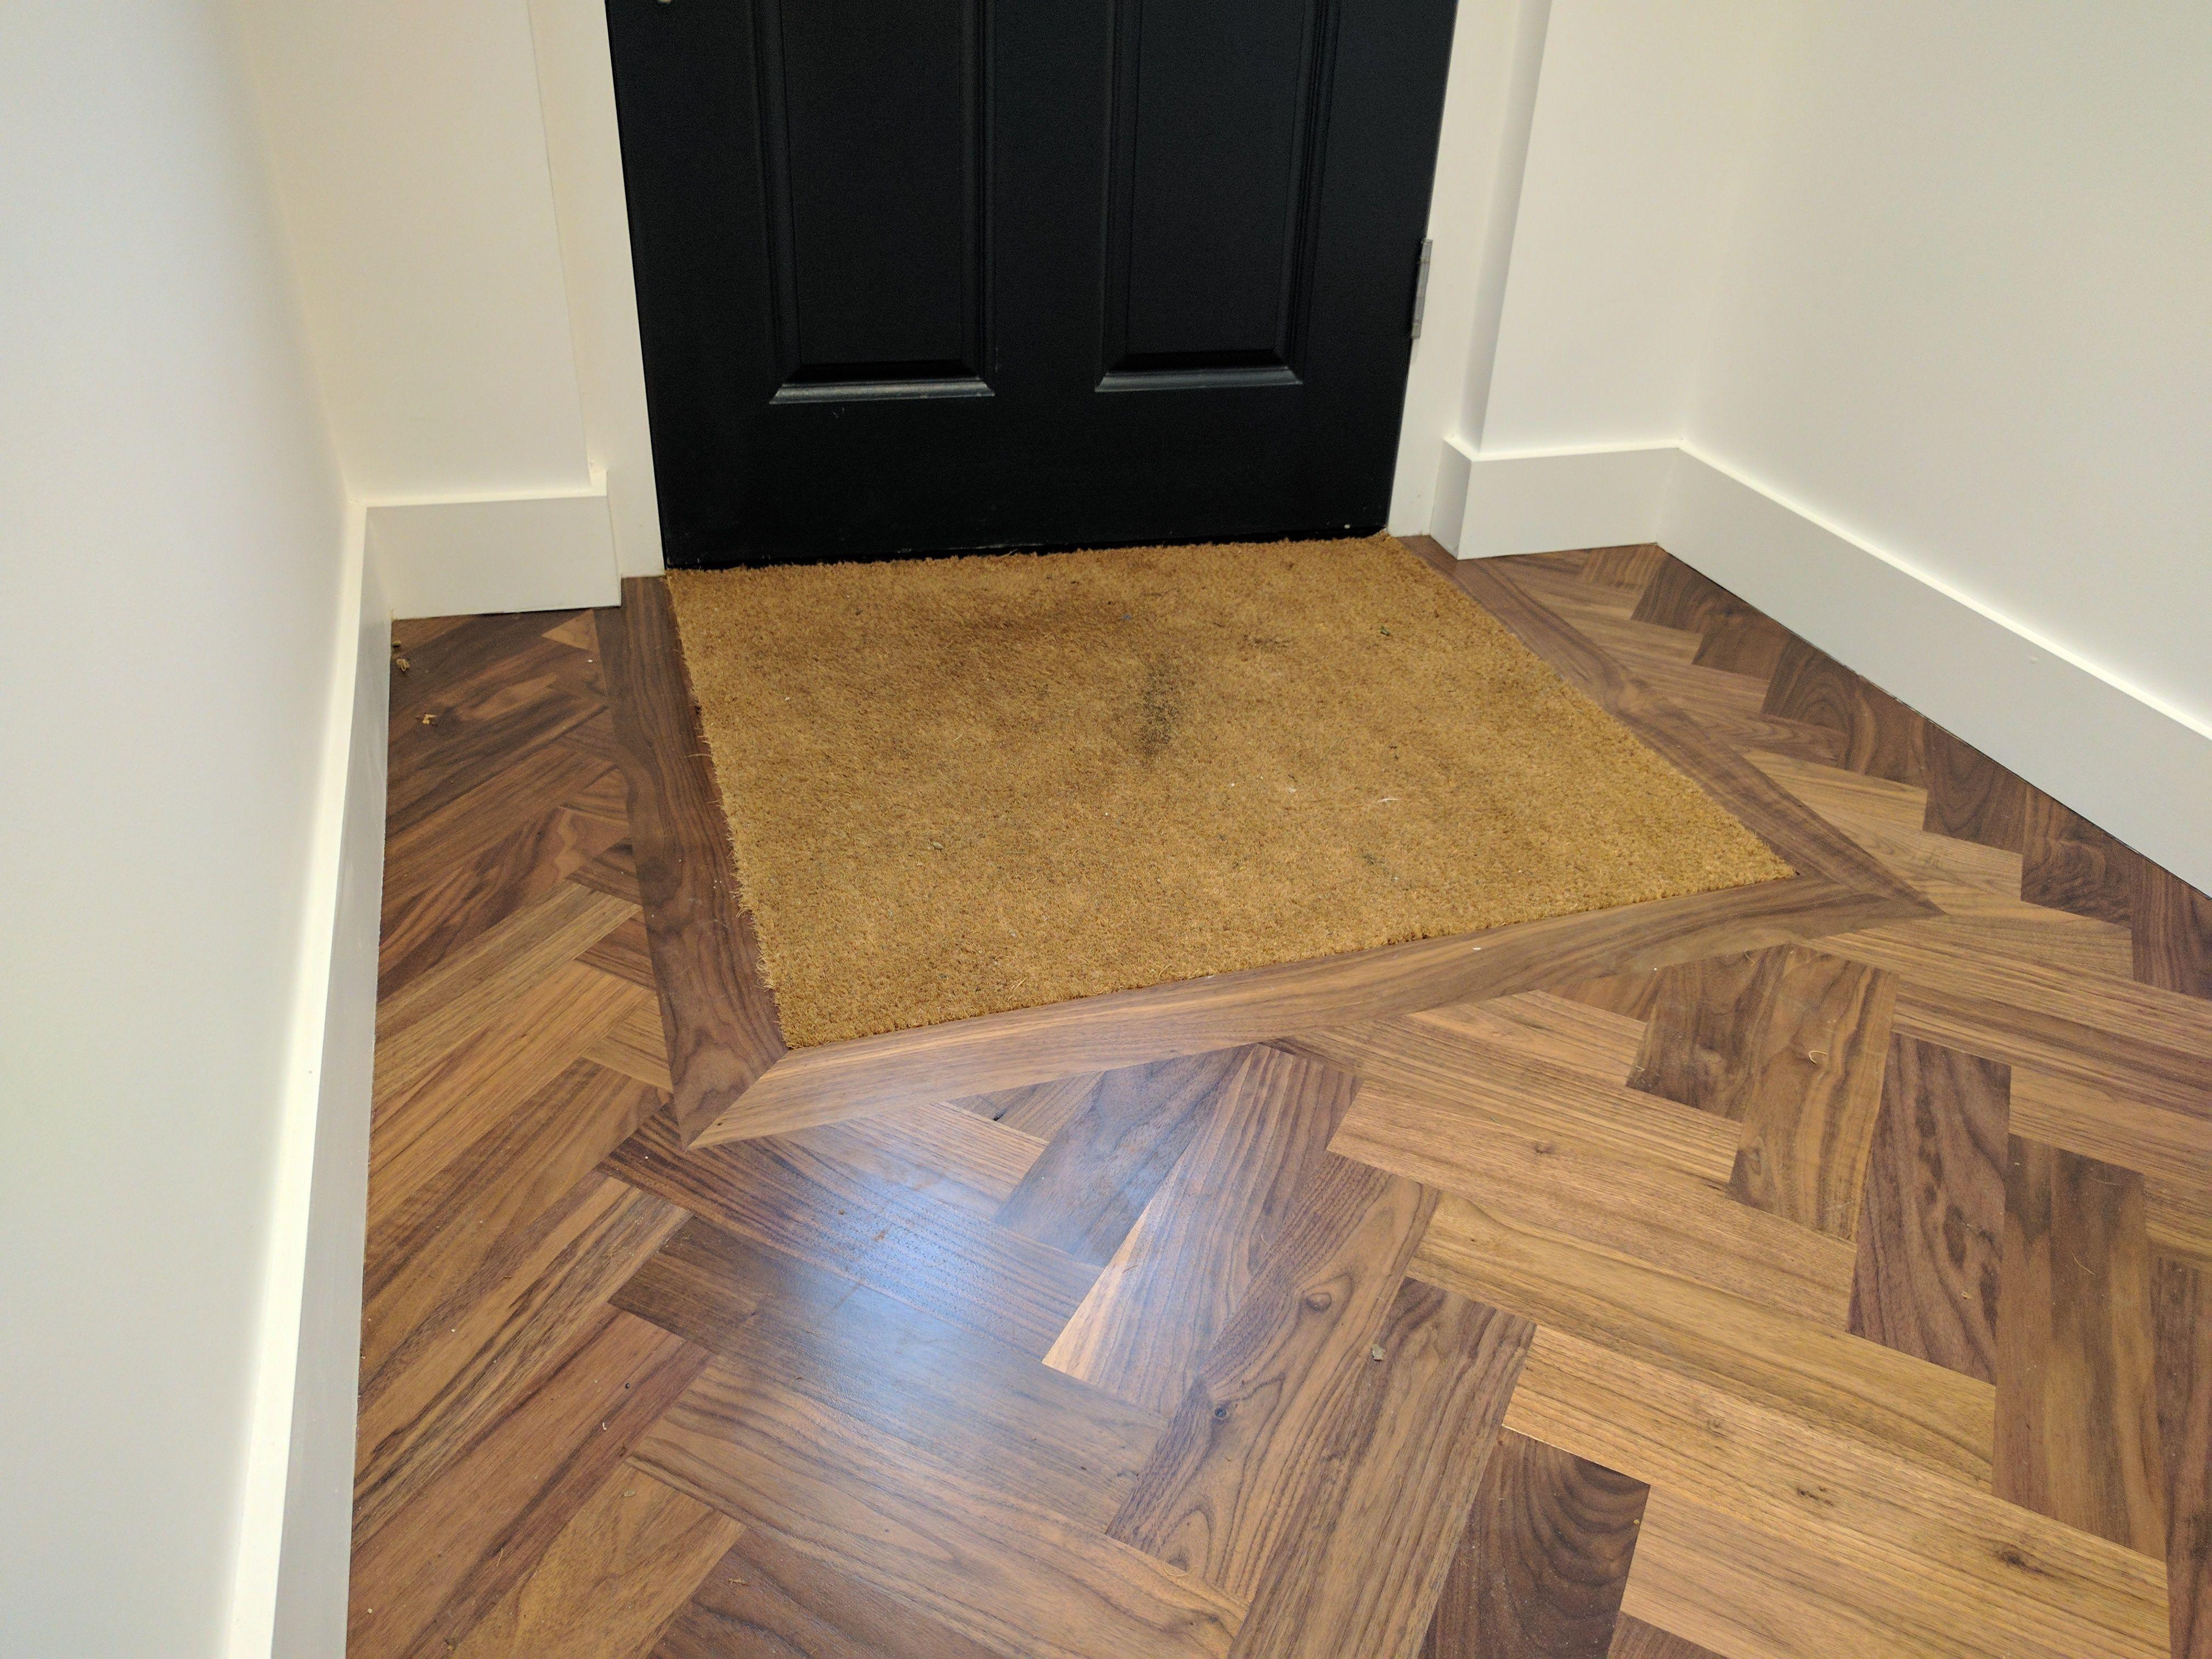 We Integrated A Doormat By The Front Door When Ed